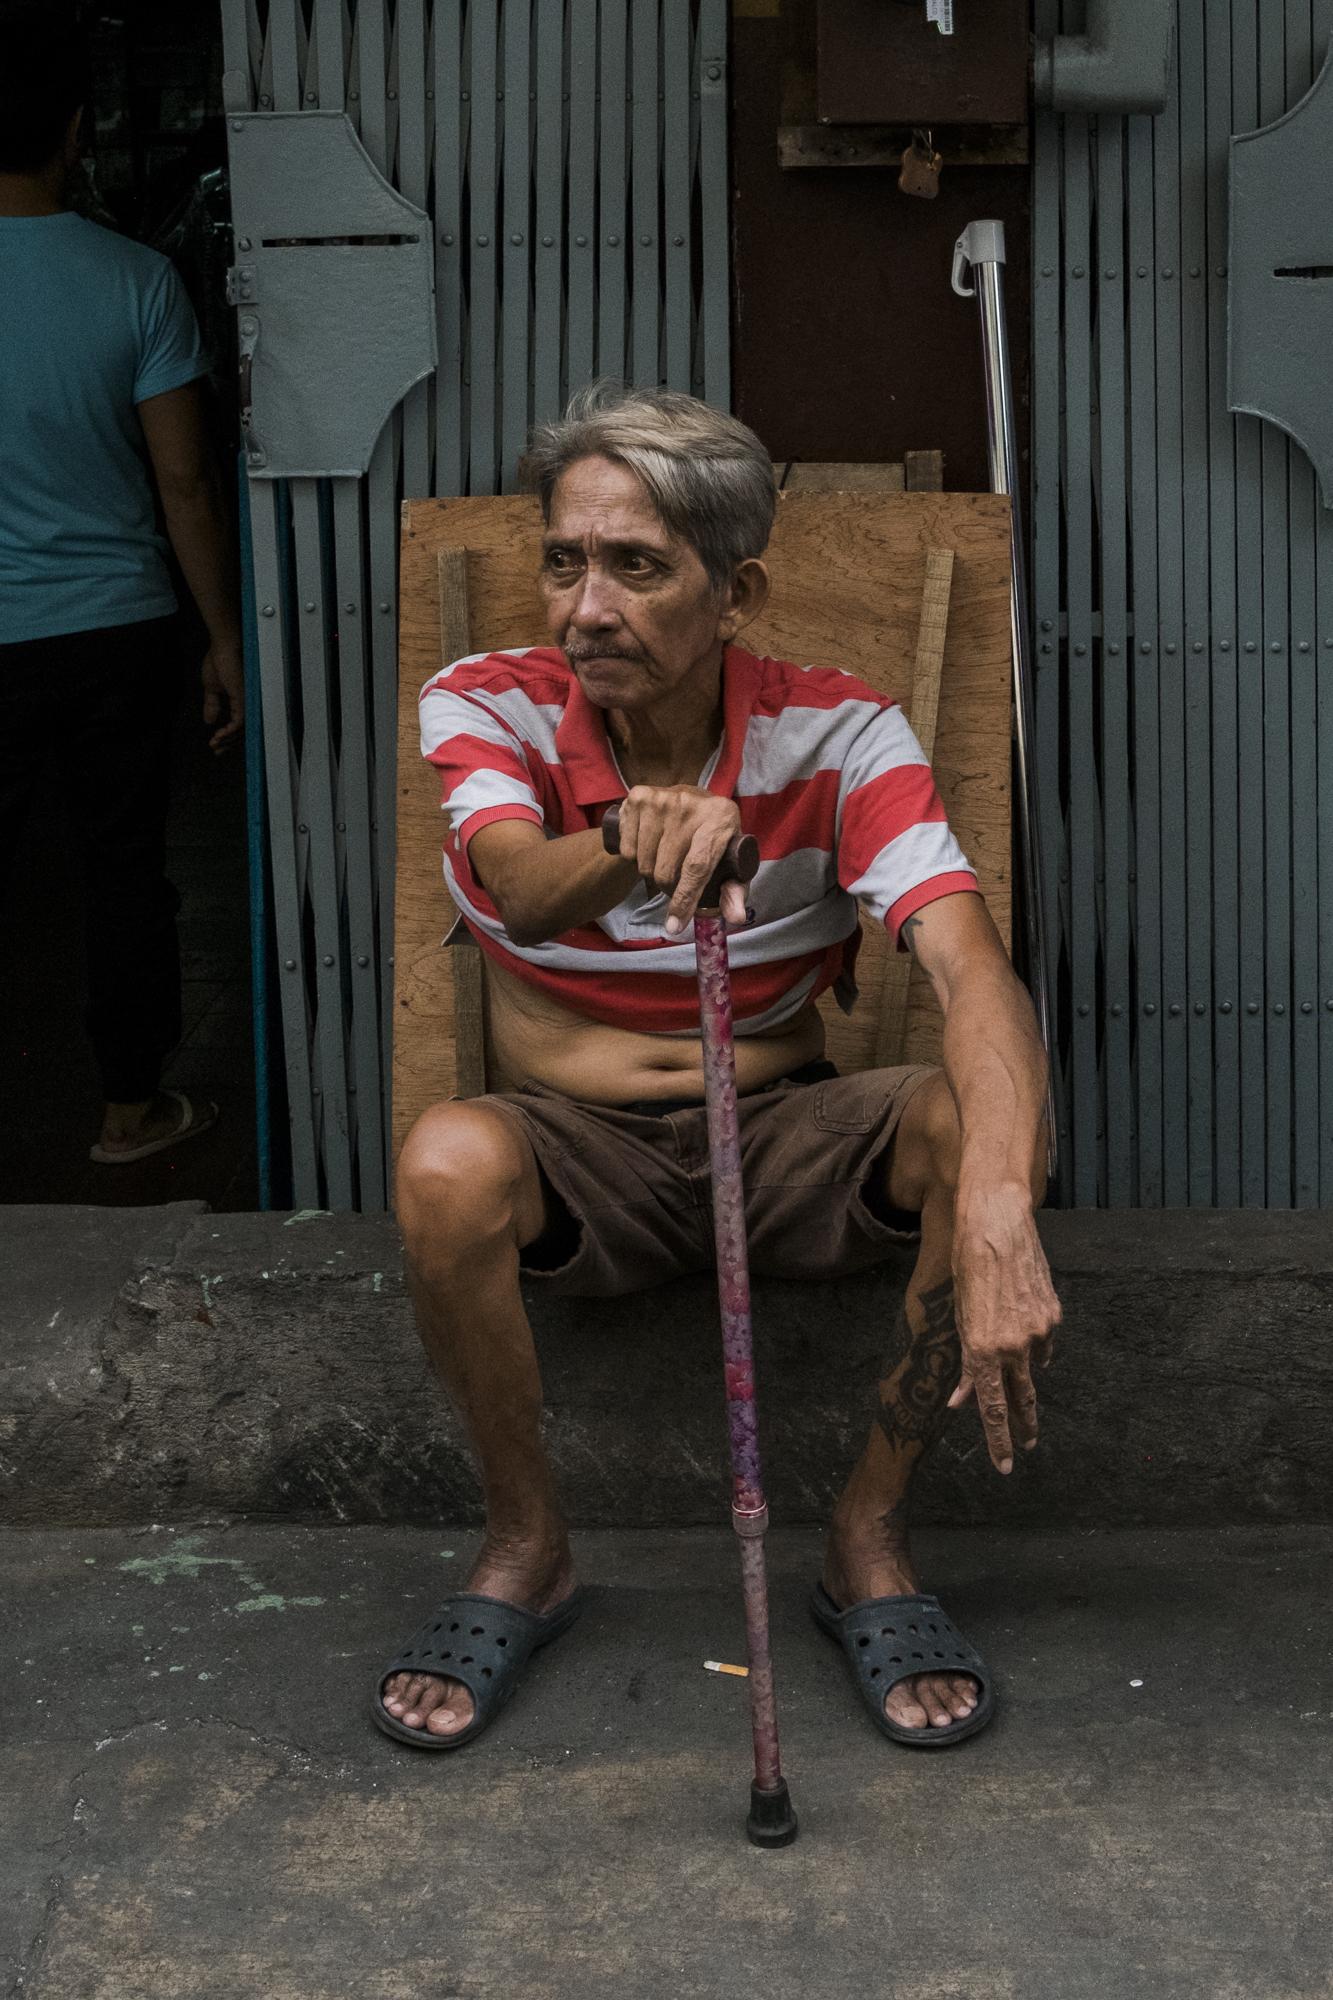 Man with Cane   Gio Panlilio, 2017